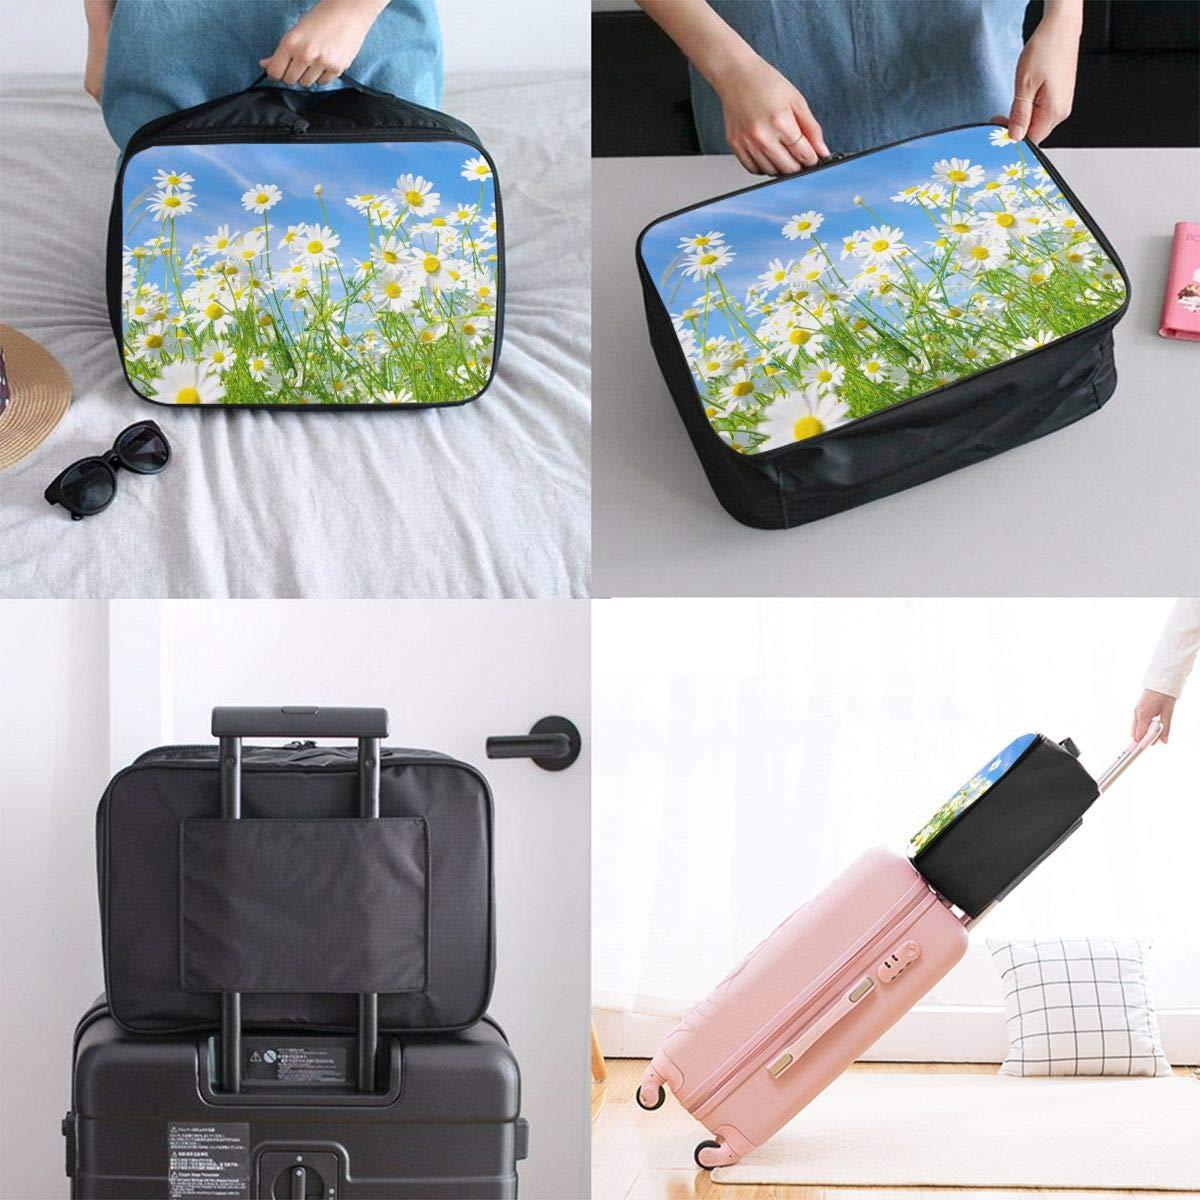 Travel Bag Daisy Flower Waterproof Large Capacity Portable Luggage Bag